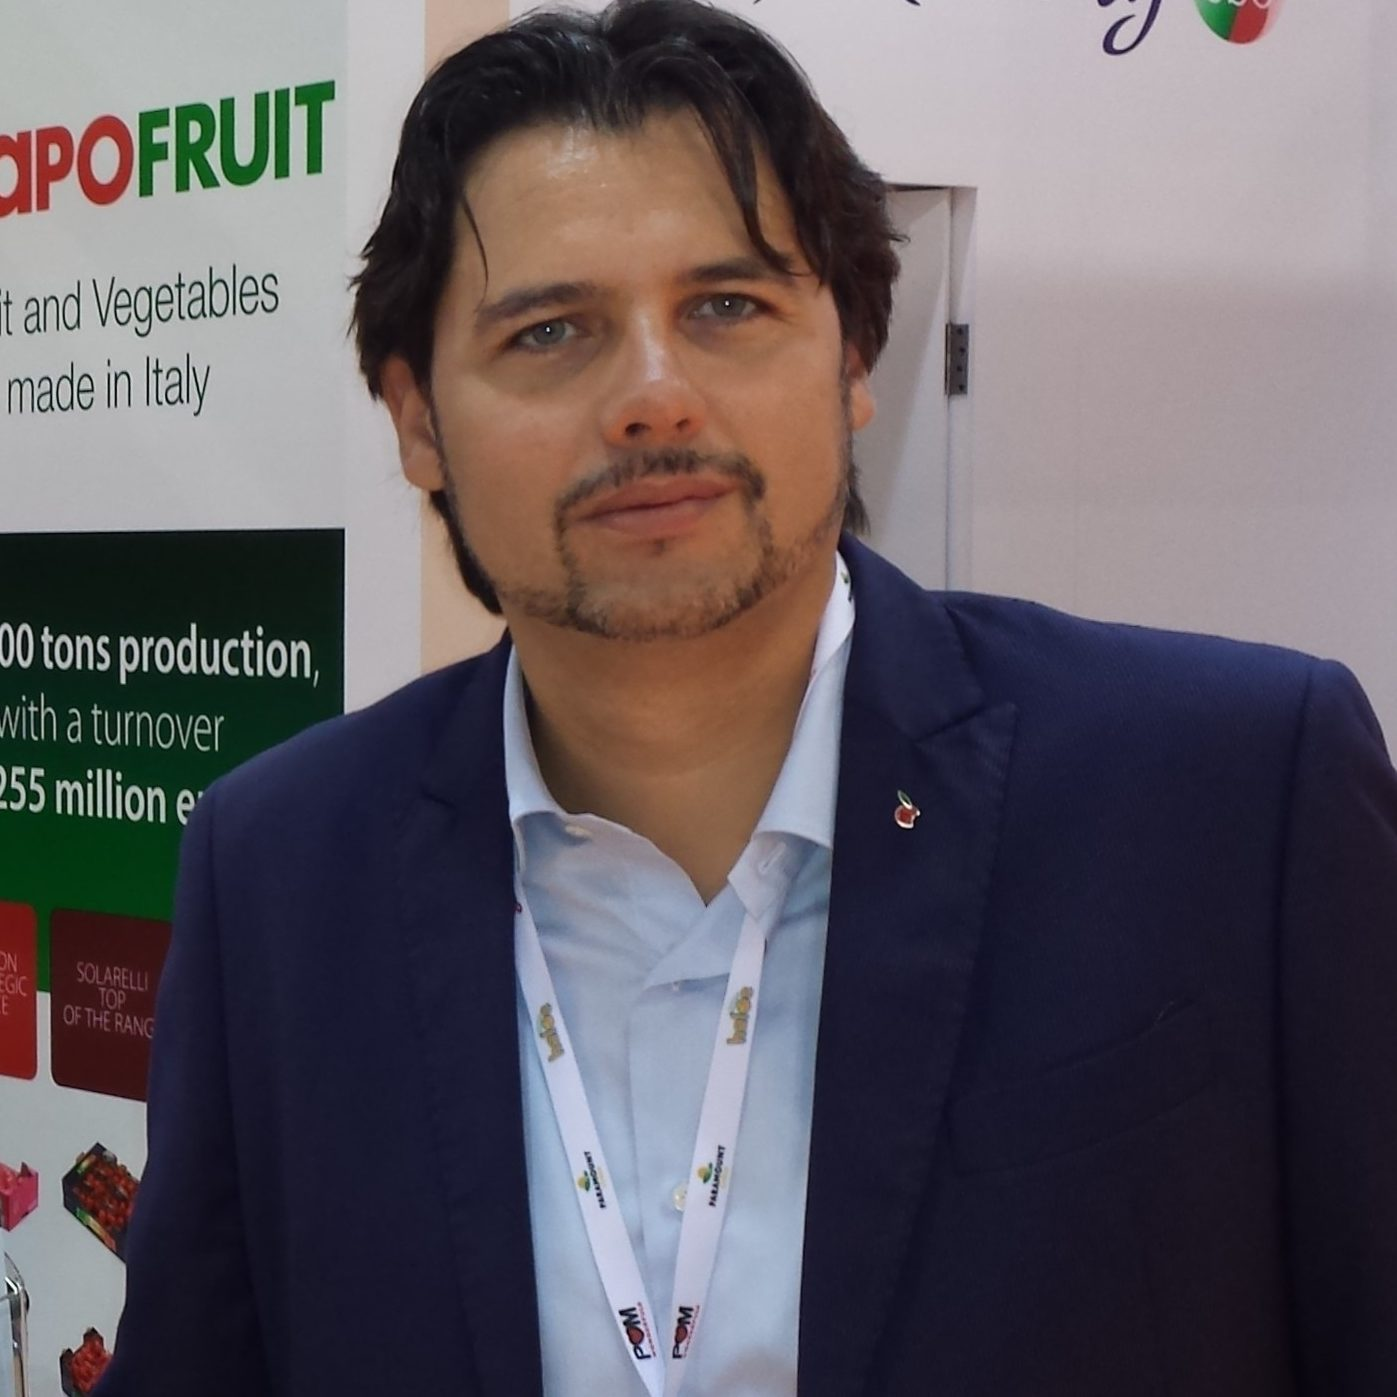 Renzo Balestri